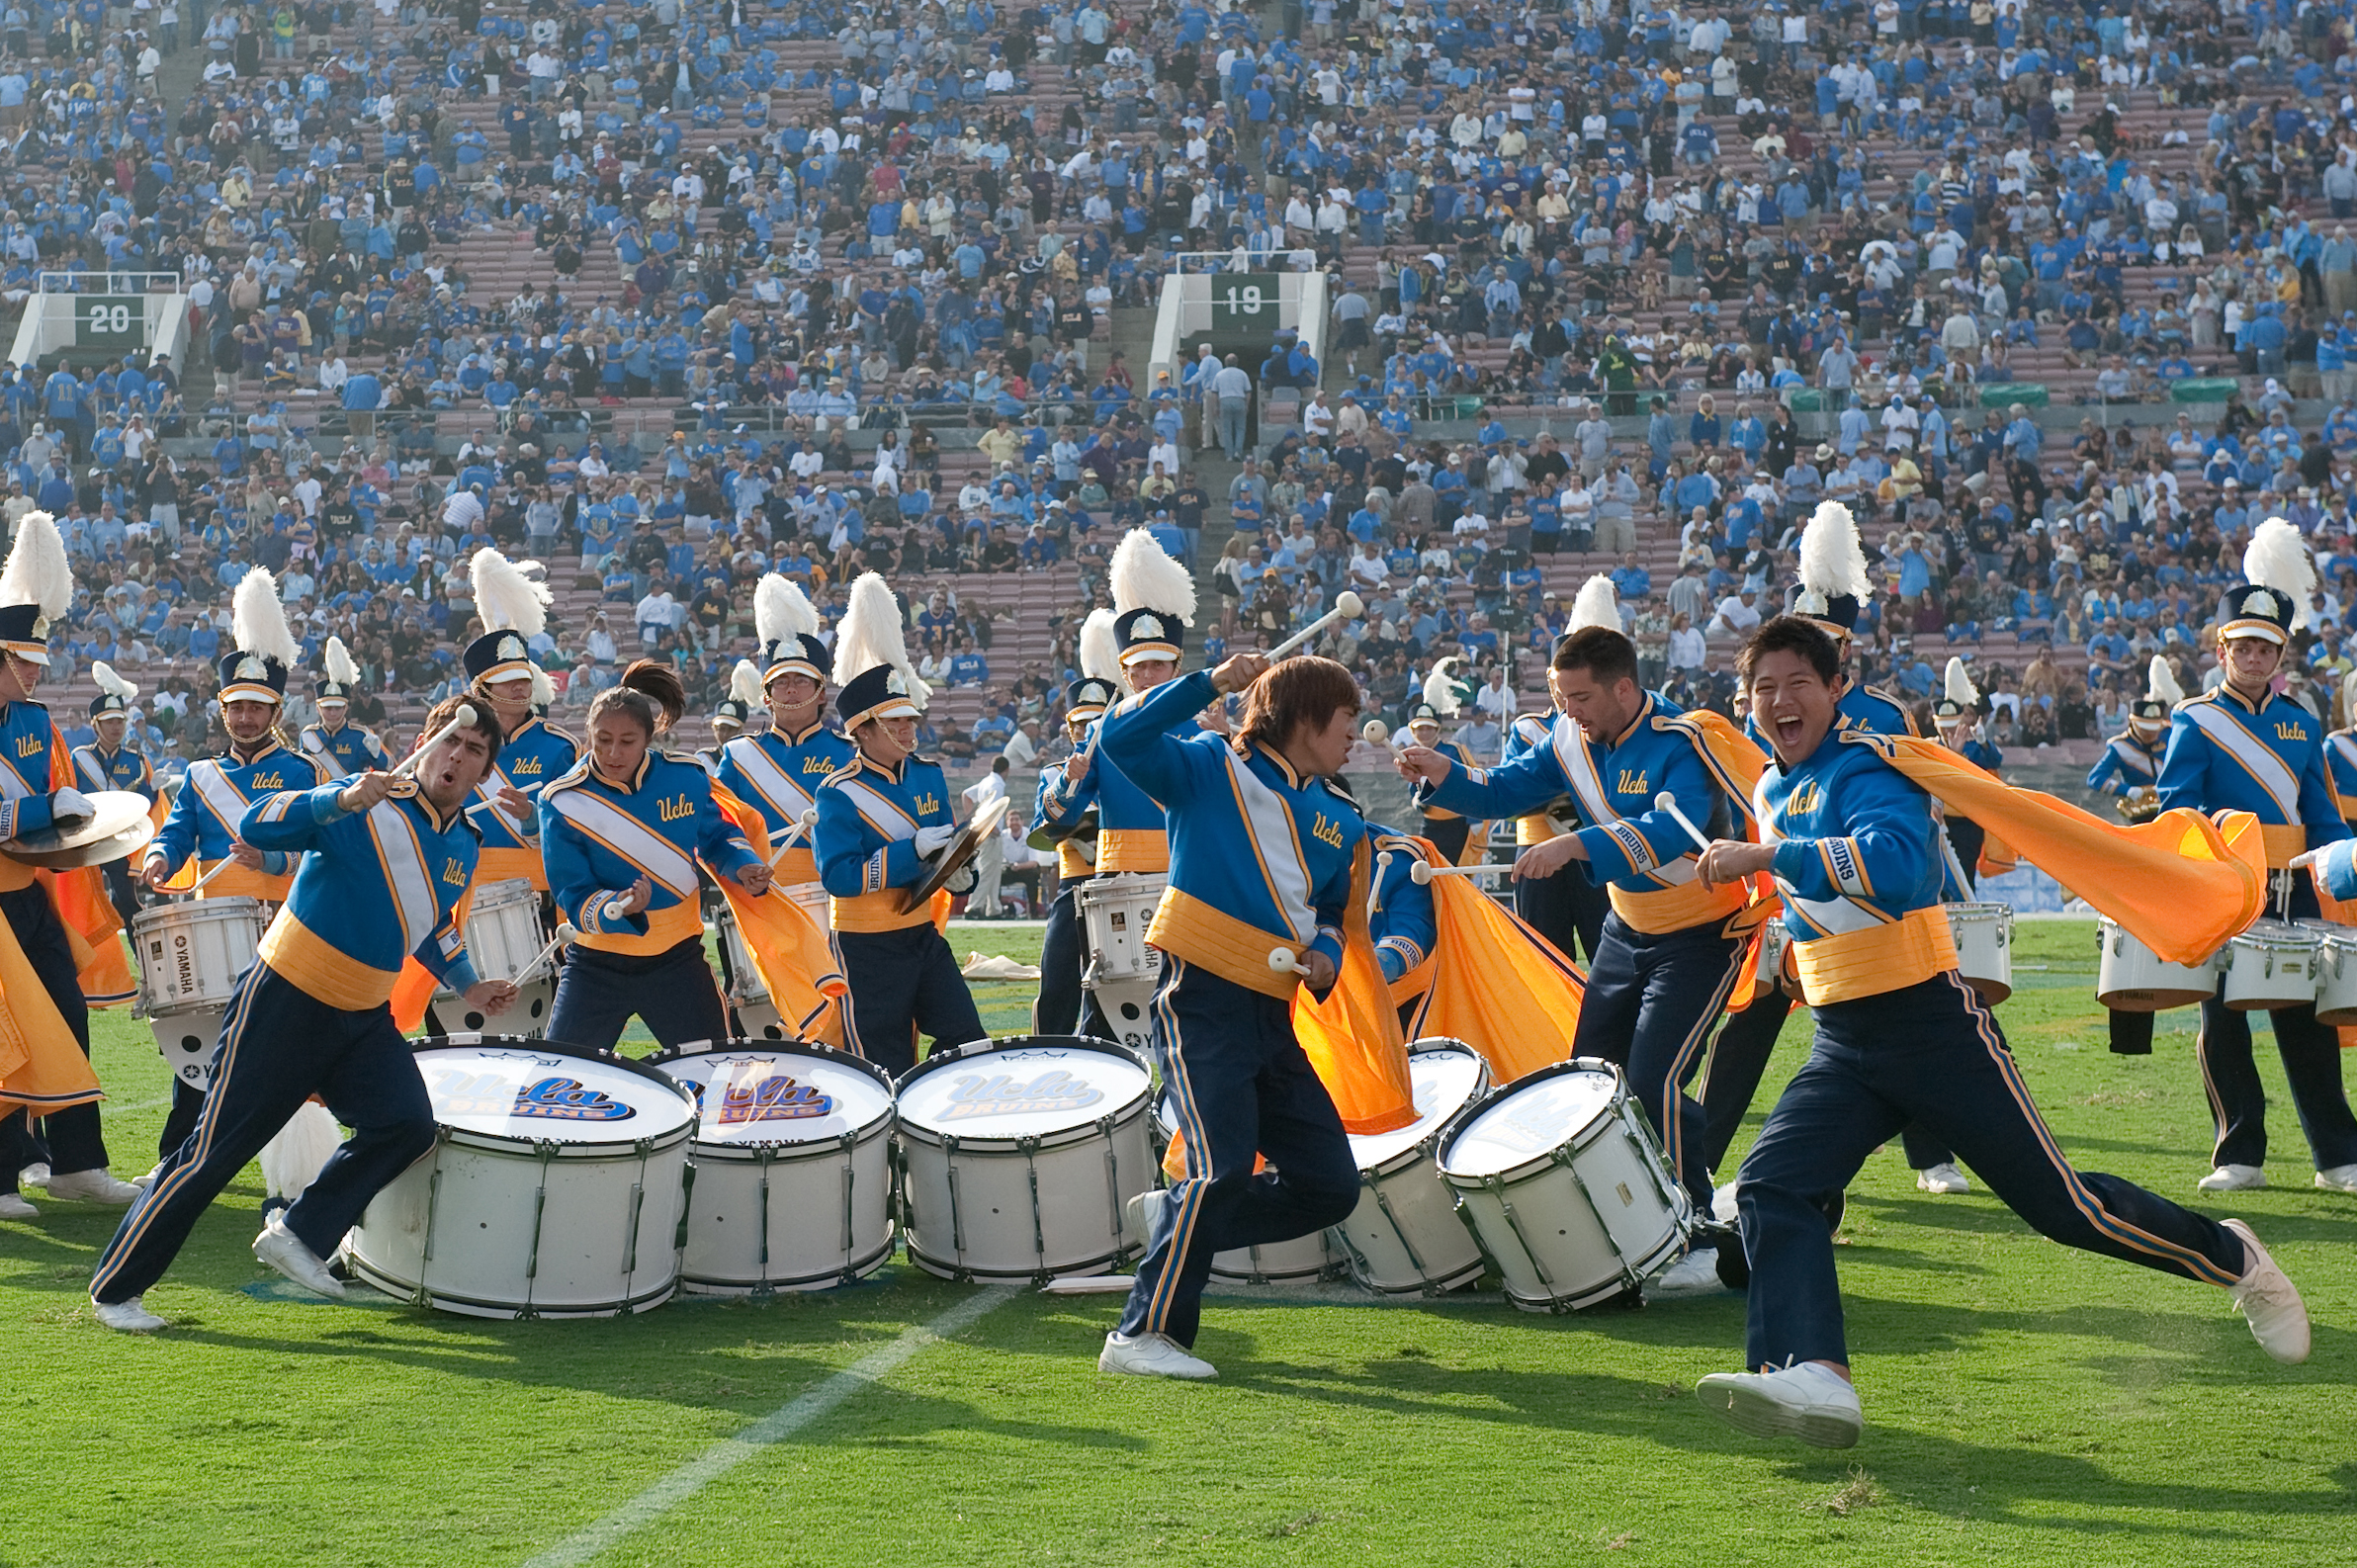 http://uclaband.com/wp-content/uploads/2015/01/Bass-Drums-2.jpg